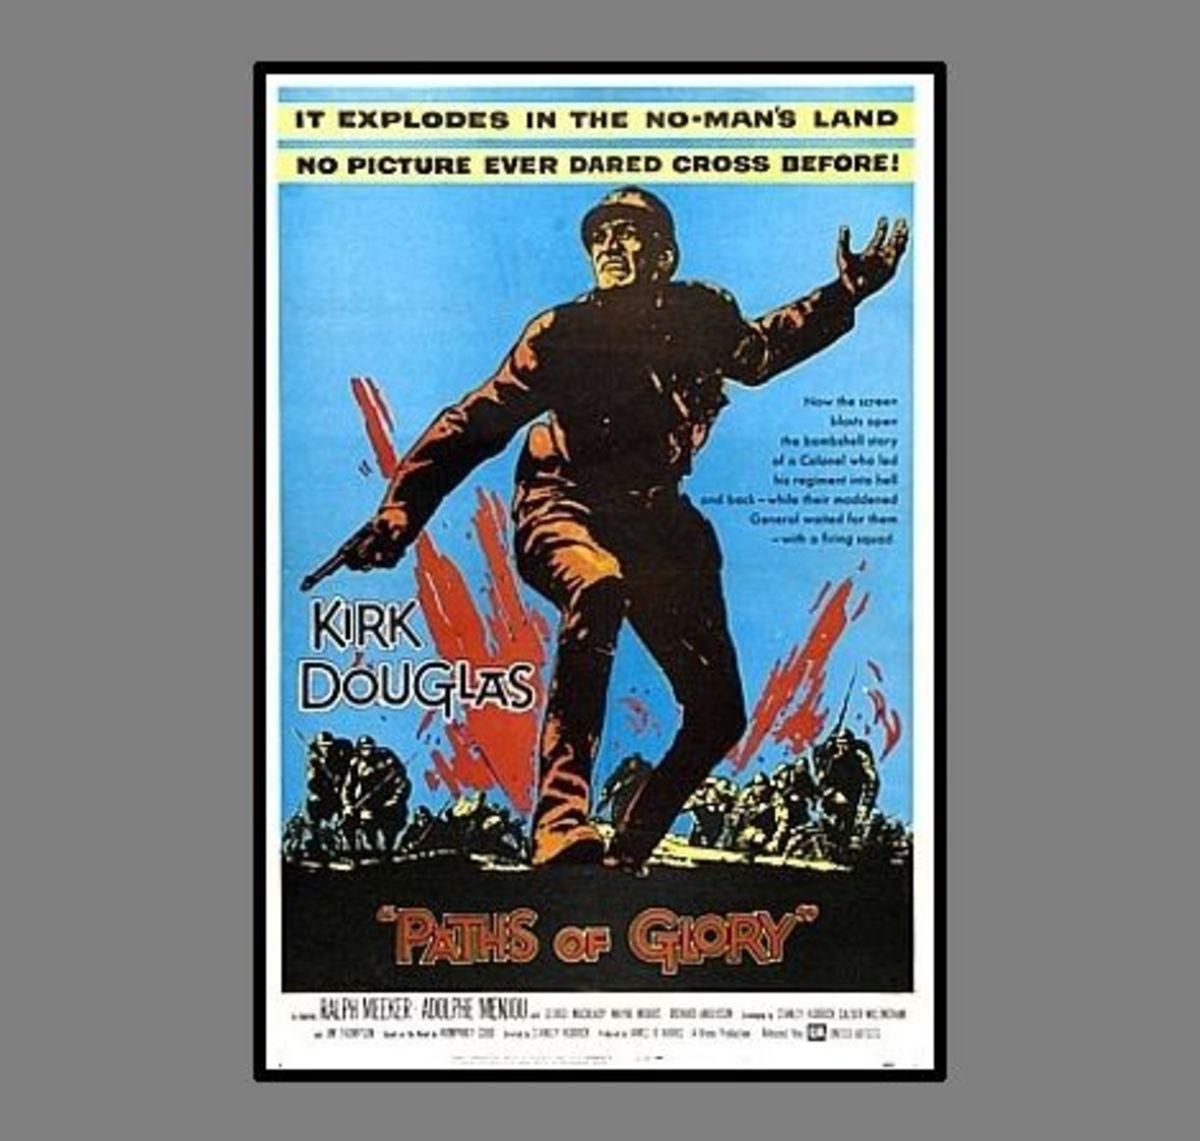 World War 1 History: General Orders Artillery Strike on Own Troops